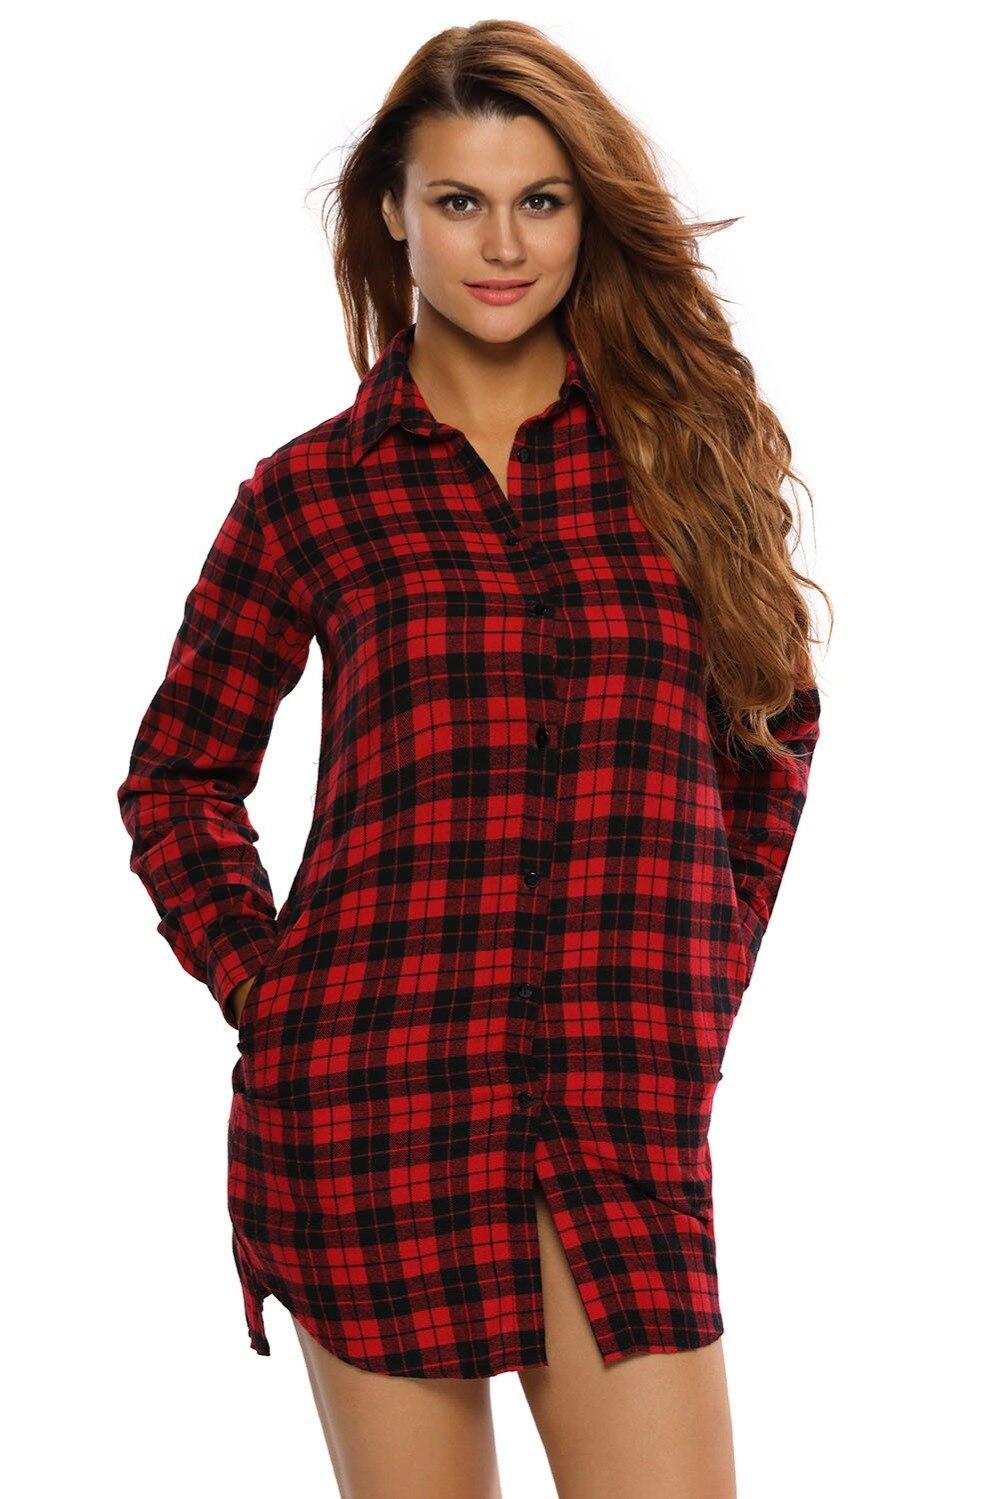 Adogirl Women Black Red Plaid Shirt 2017 Autumn Sale Lady Female Turn Down  Collar Button Long - Popular Black Plaid Shirt Women-Buy Cheap Black Plaid Shirt Women